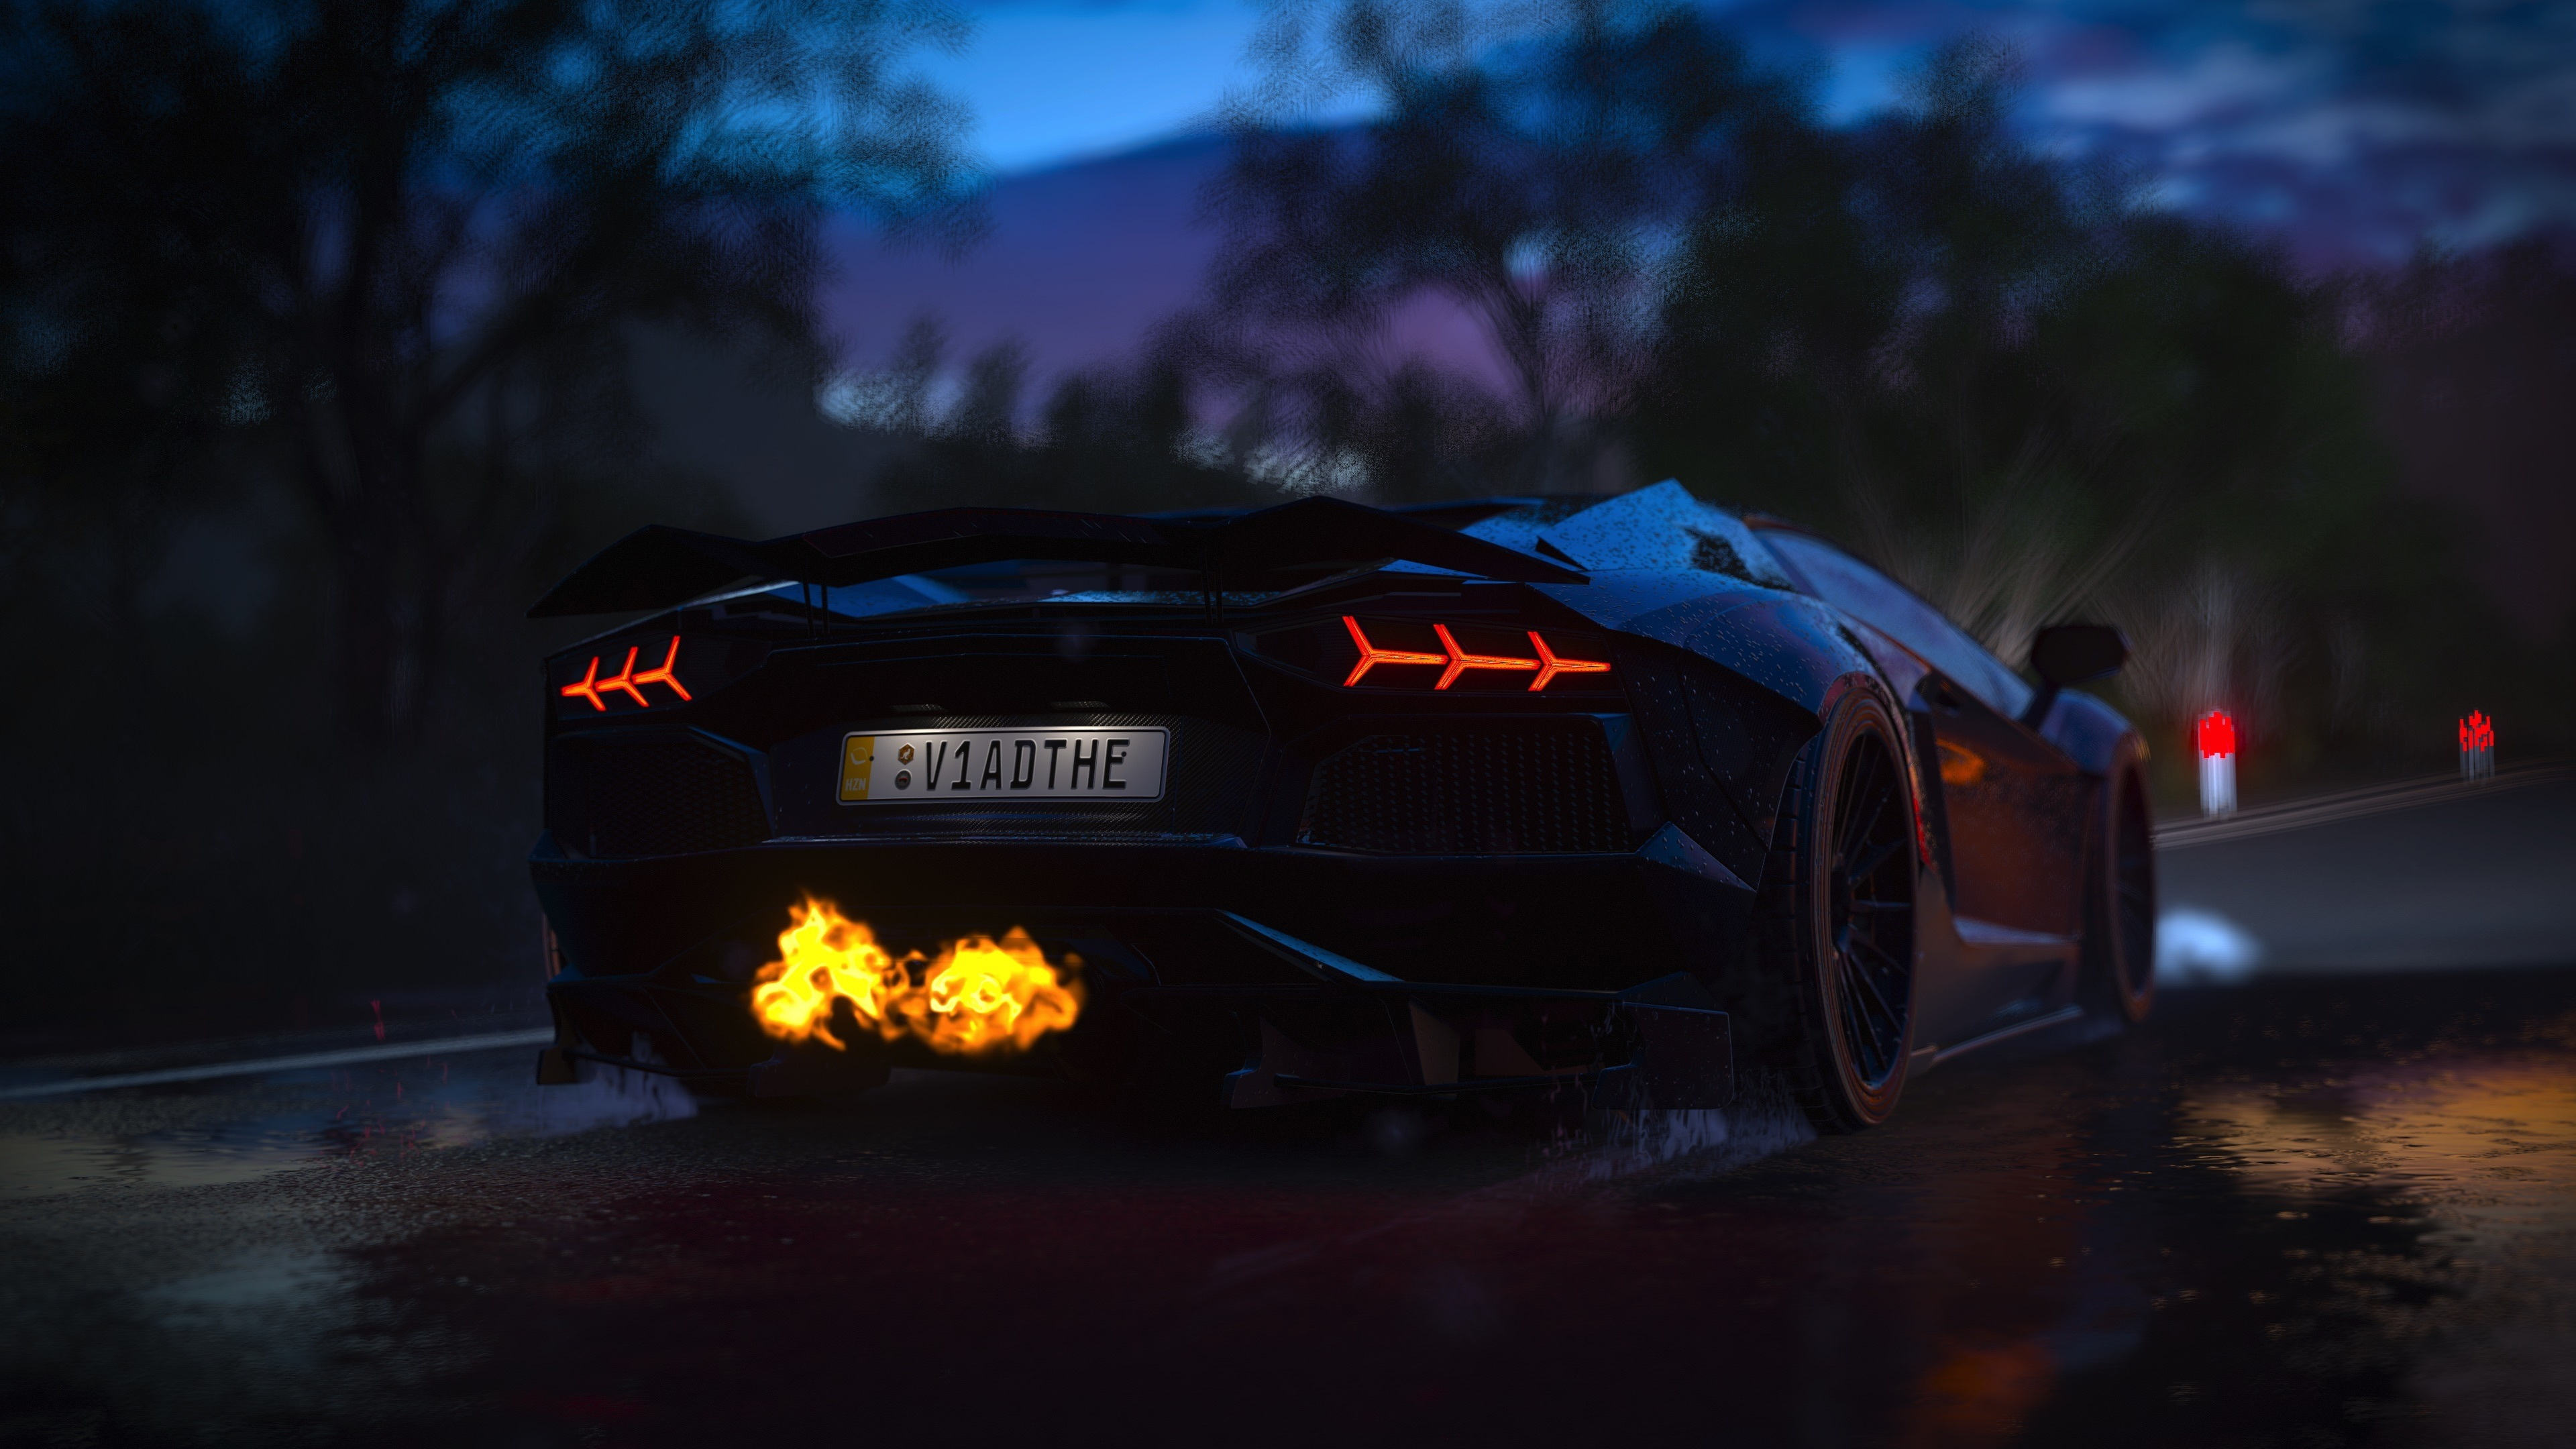 Download 3840x2400 Wallpaper Forza Horizon 3 Lamborghini